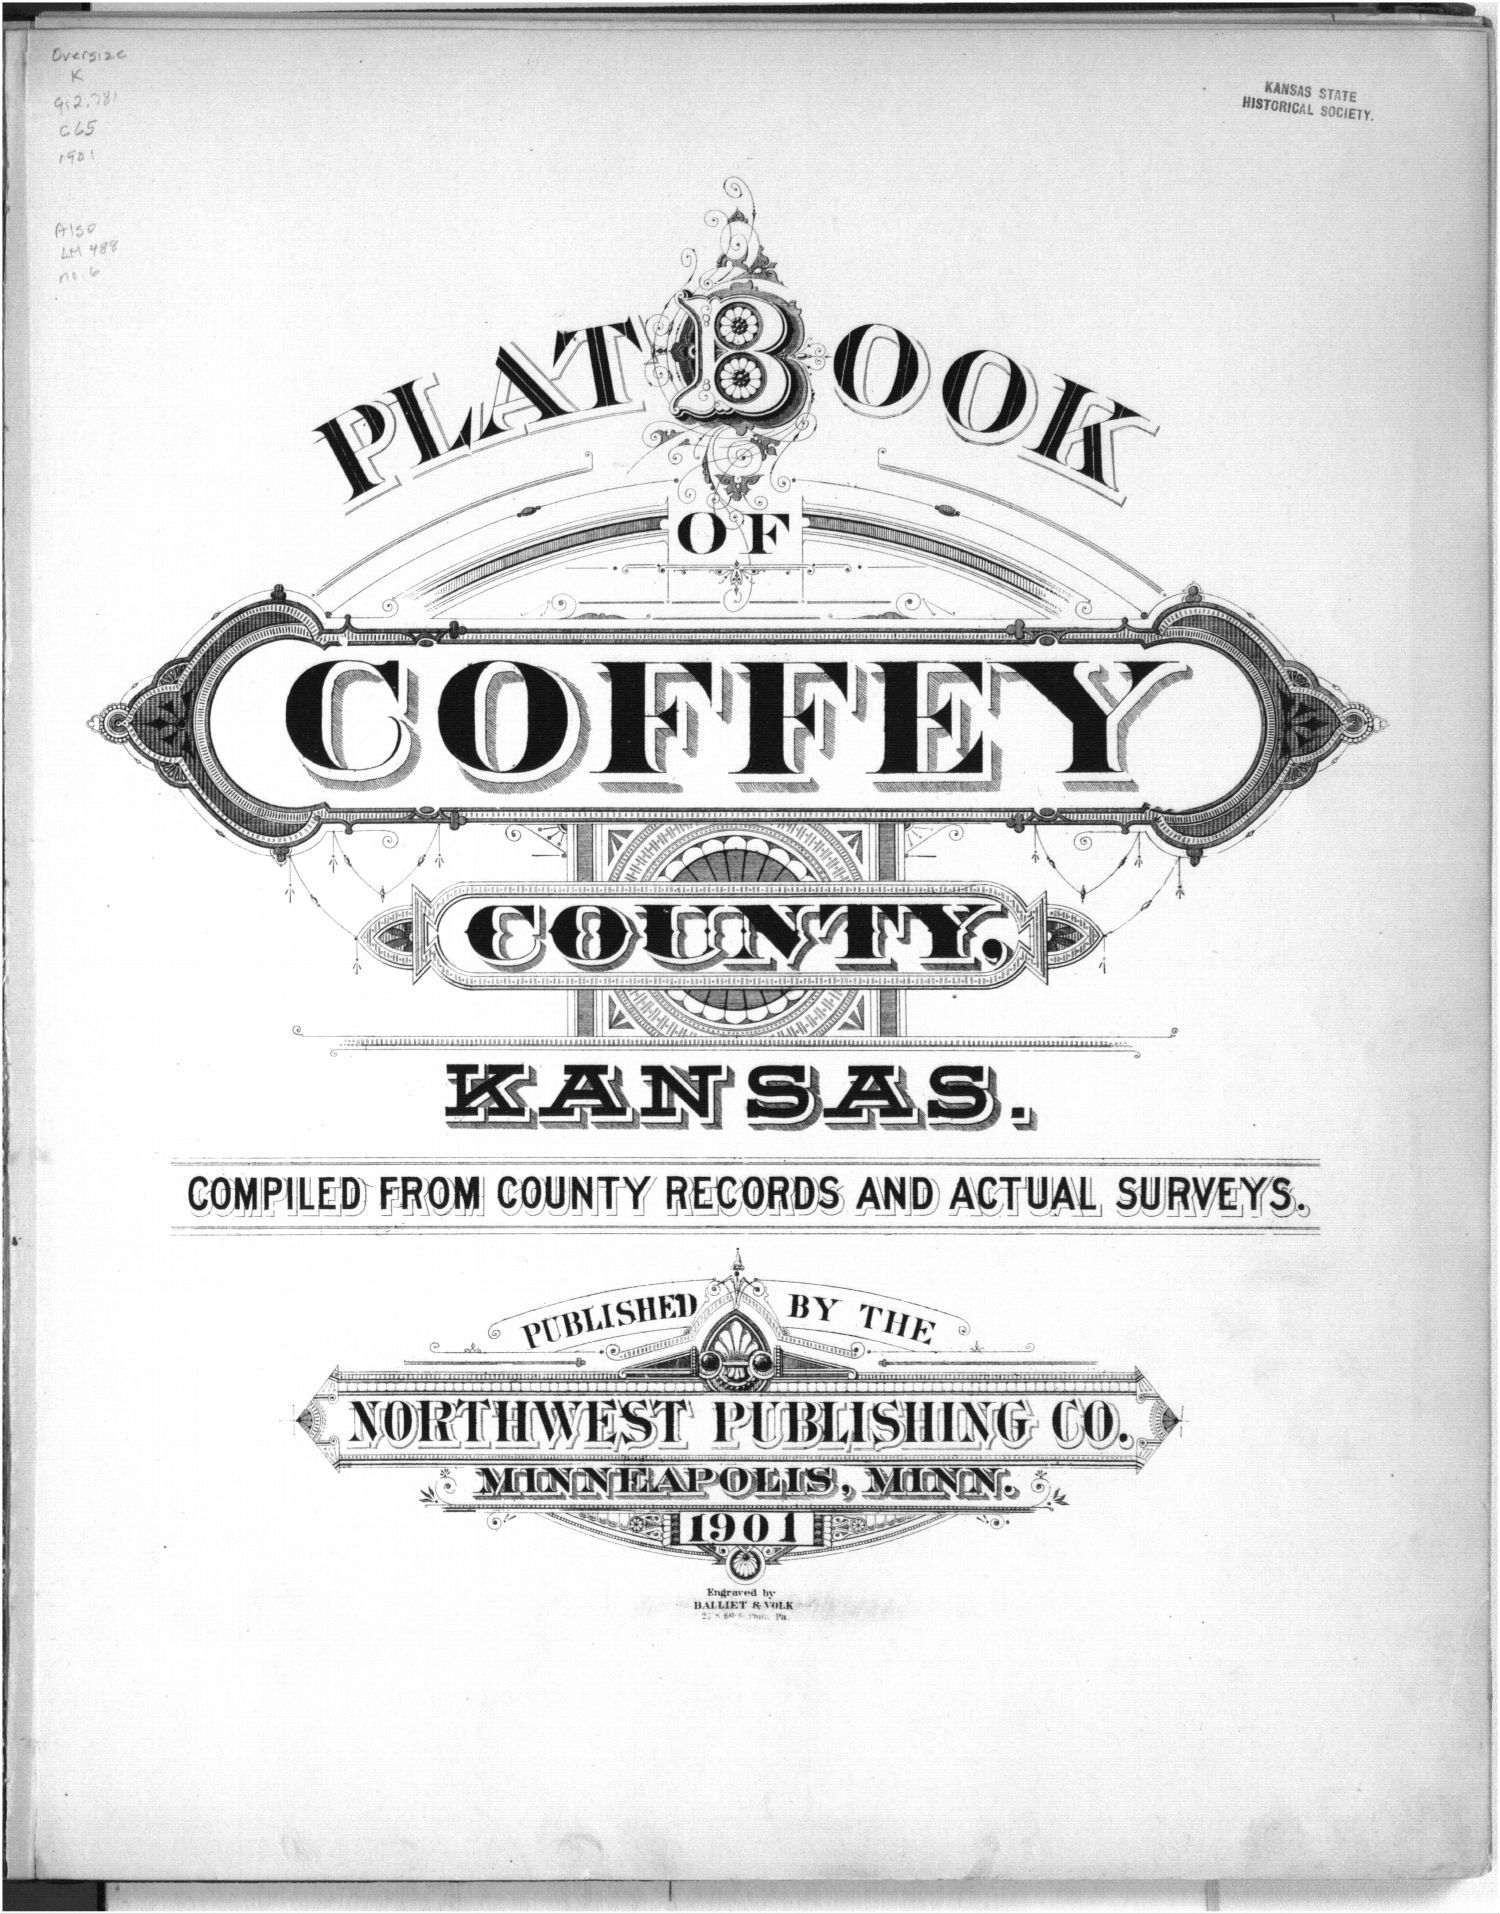 Plat book, Coffey County, Kansas - Title Page